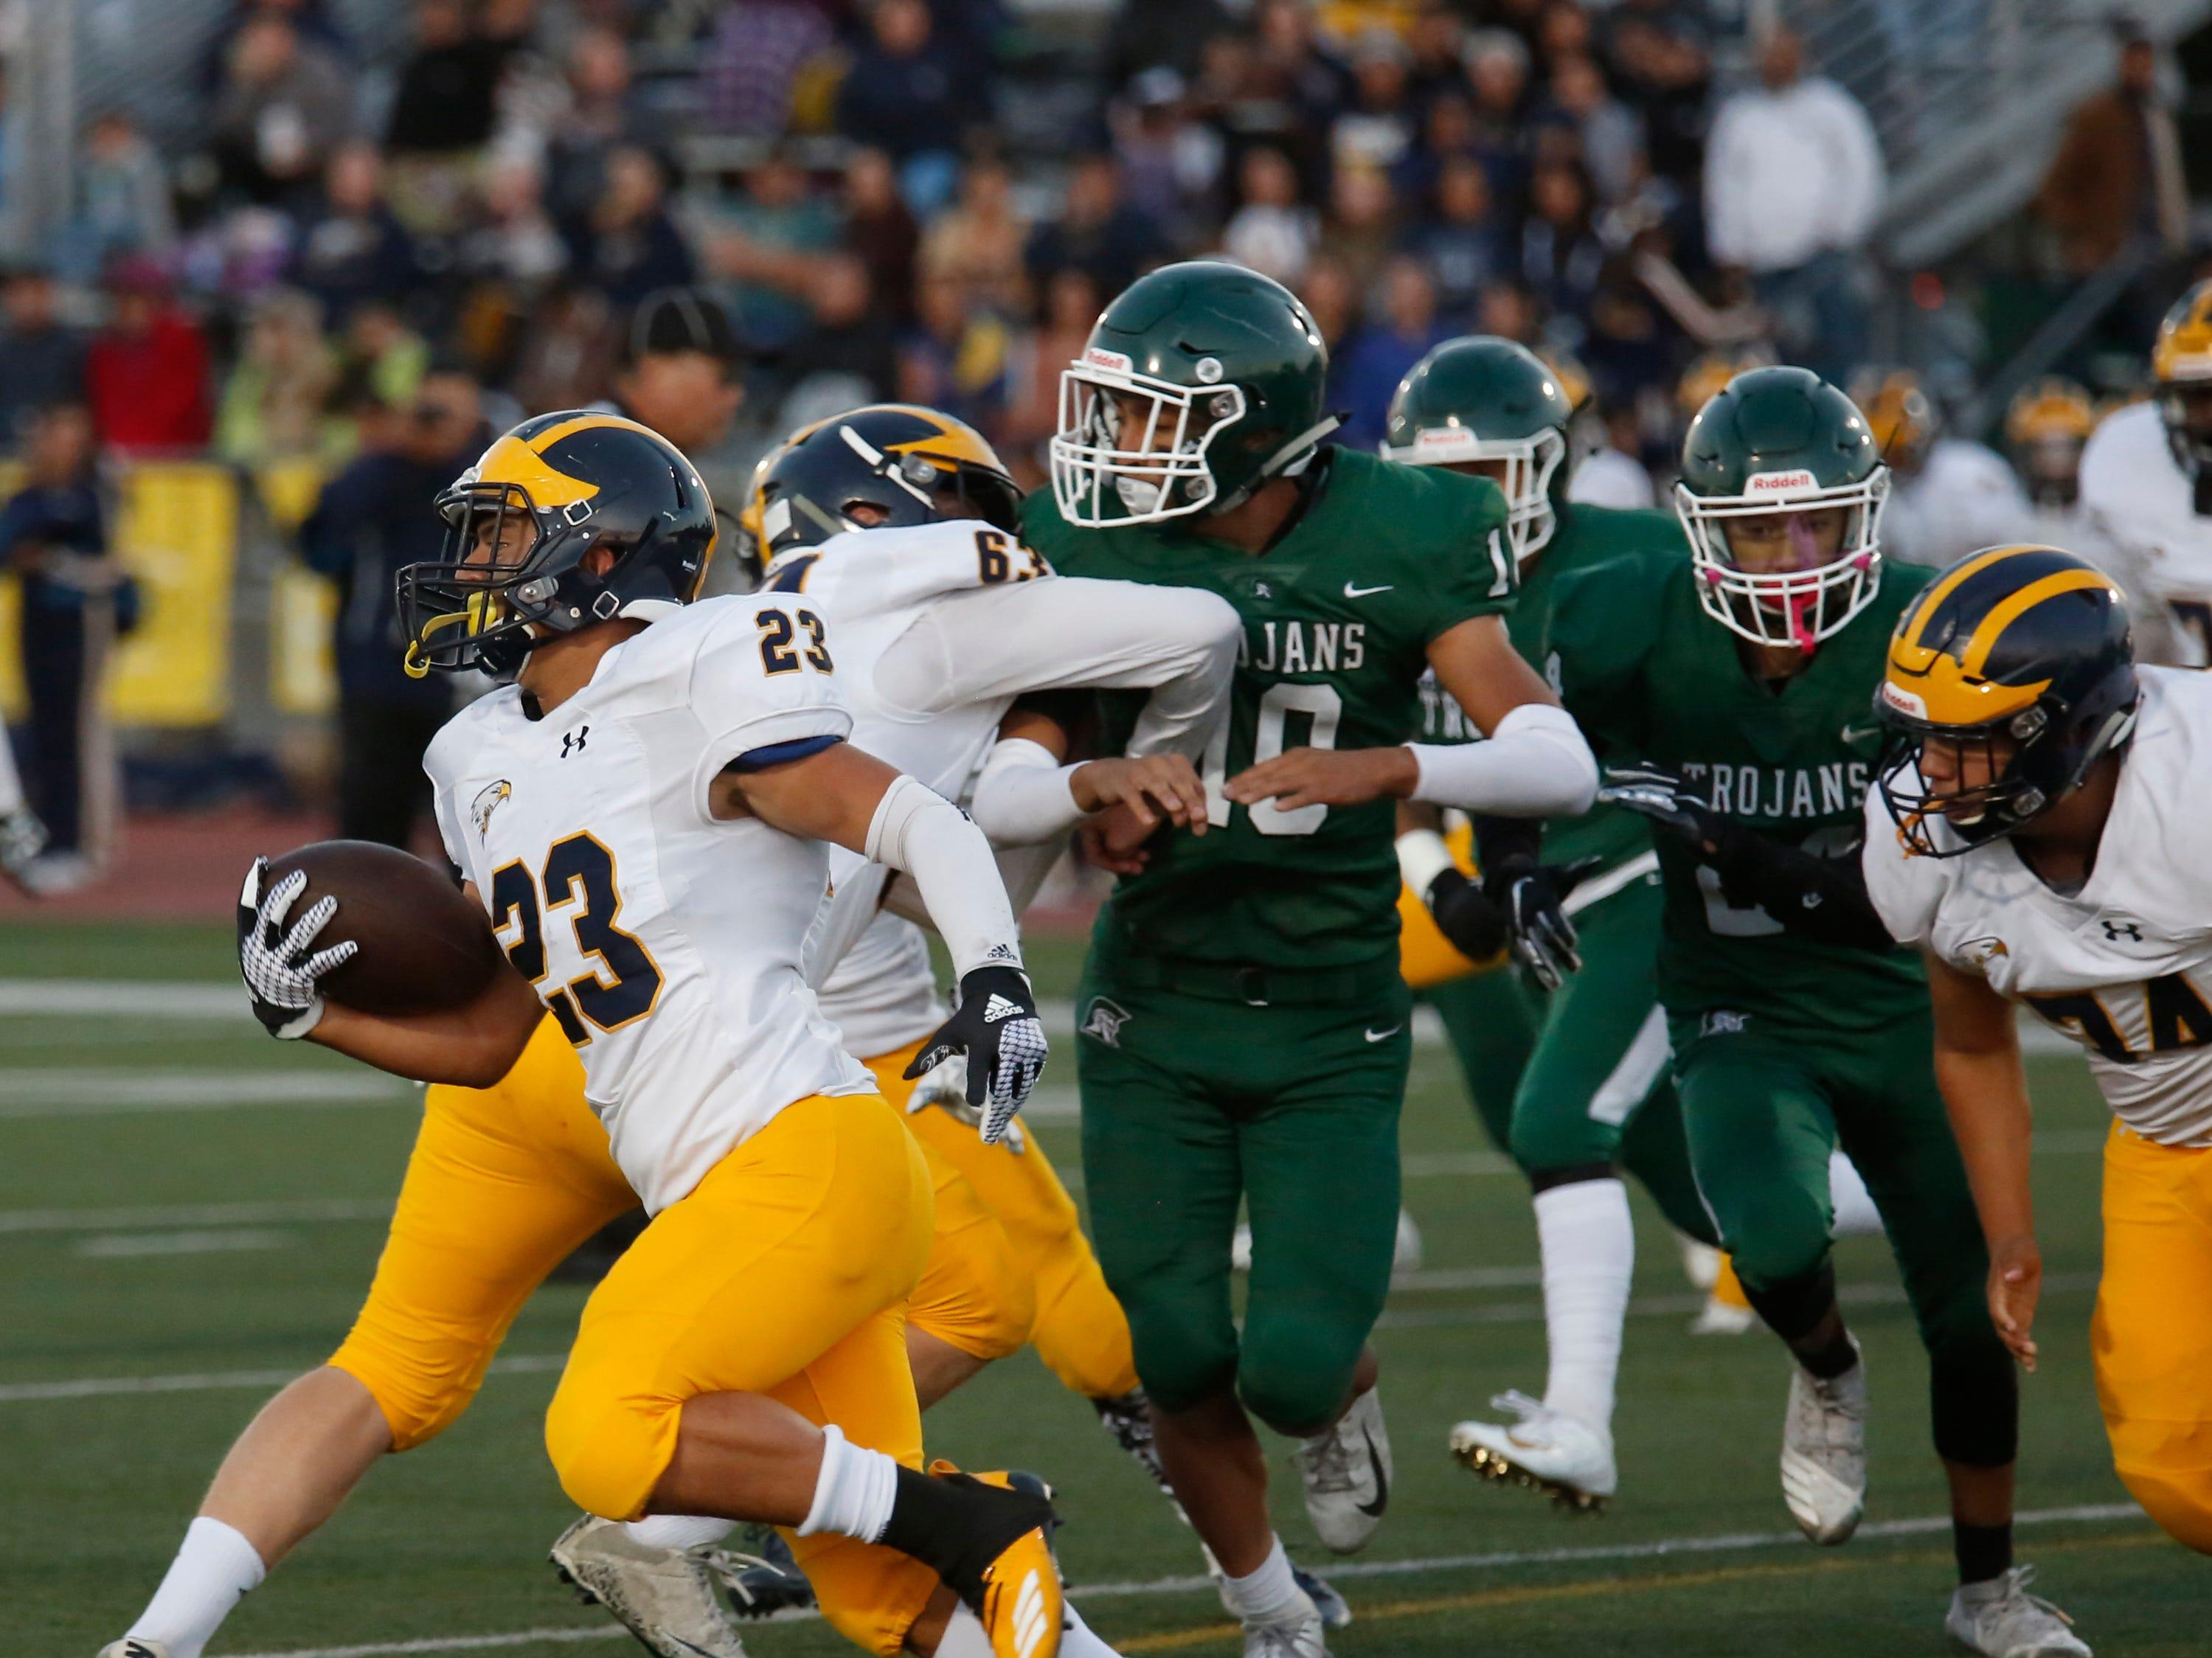 Everett Alvarez's Elijah Alvarez scrambles for yards during football at Alisal High School in Salinas on Friday August 31, 2018. (Photo By David Royal)